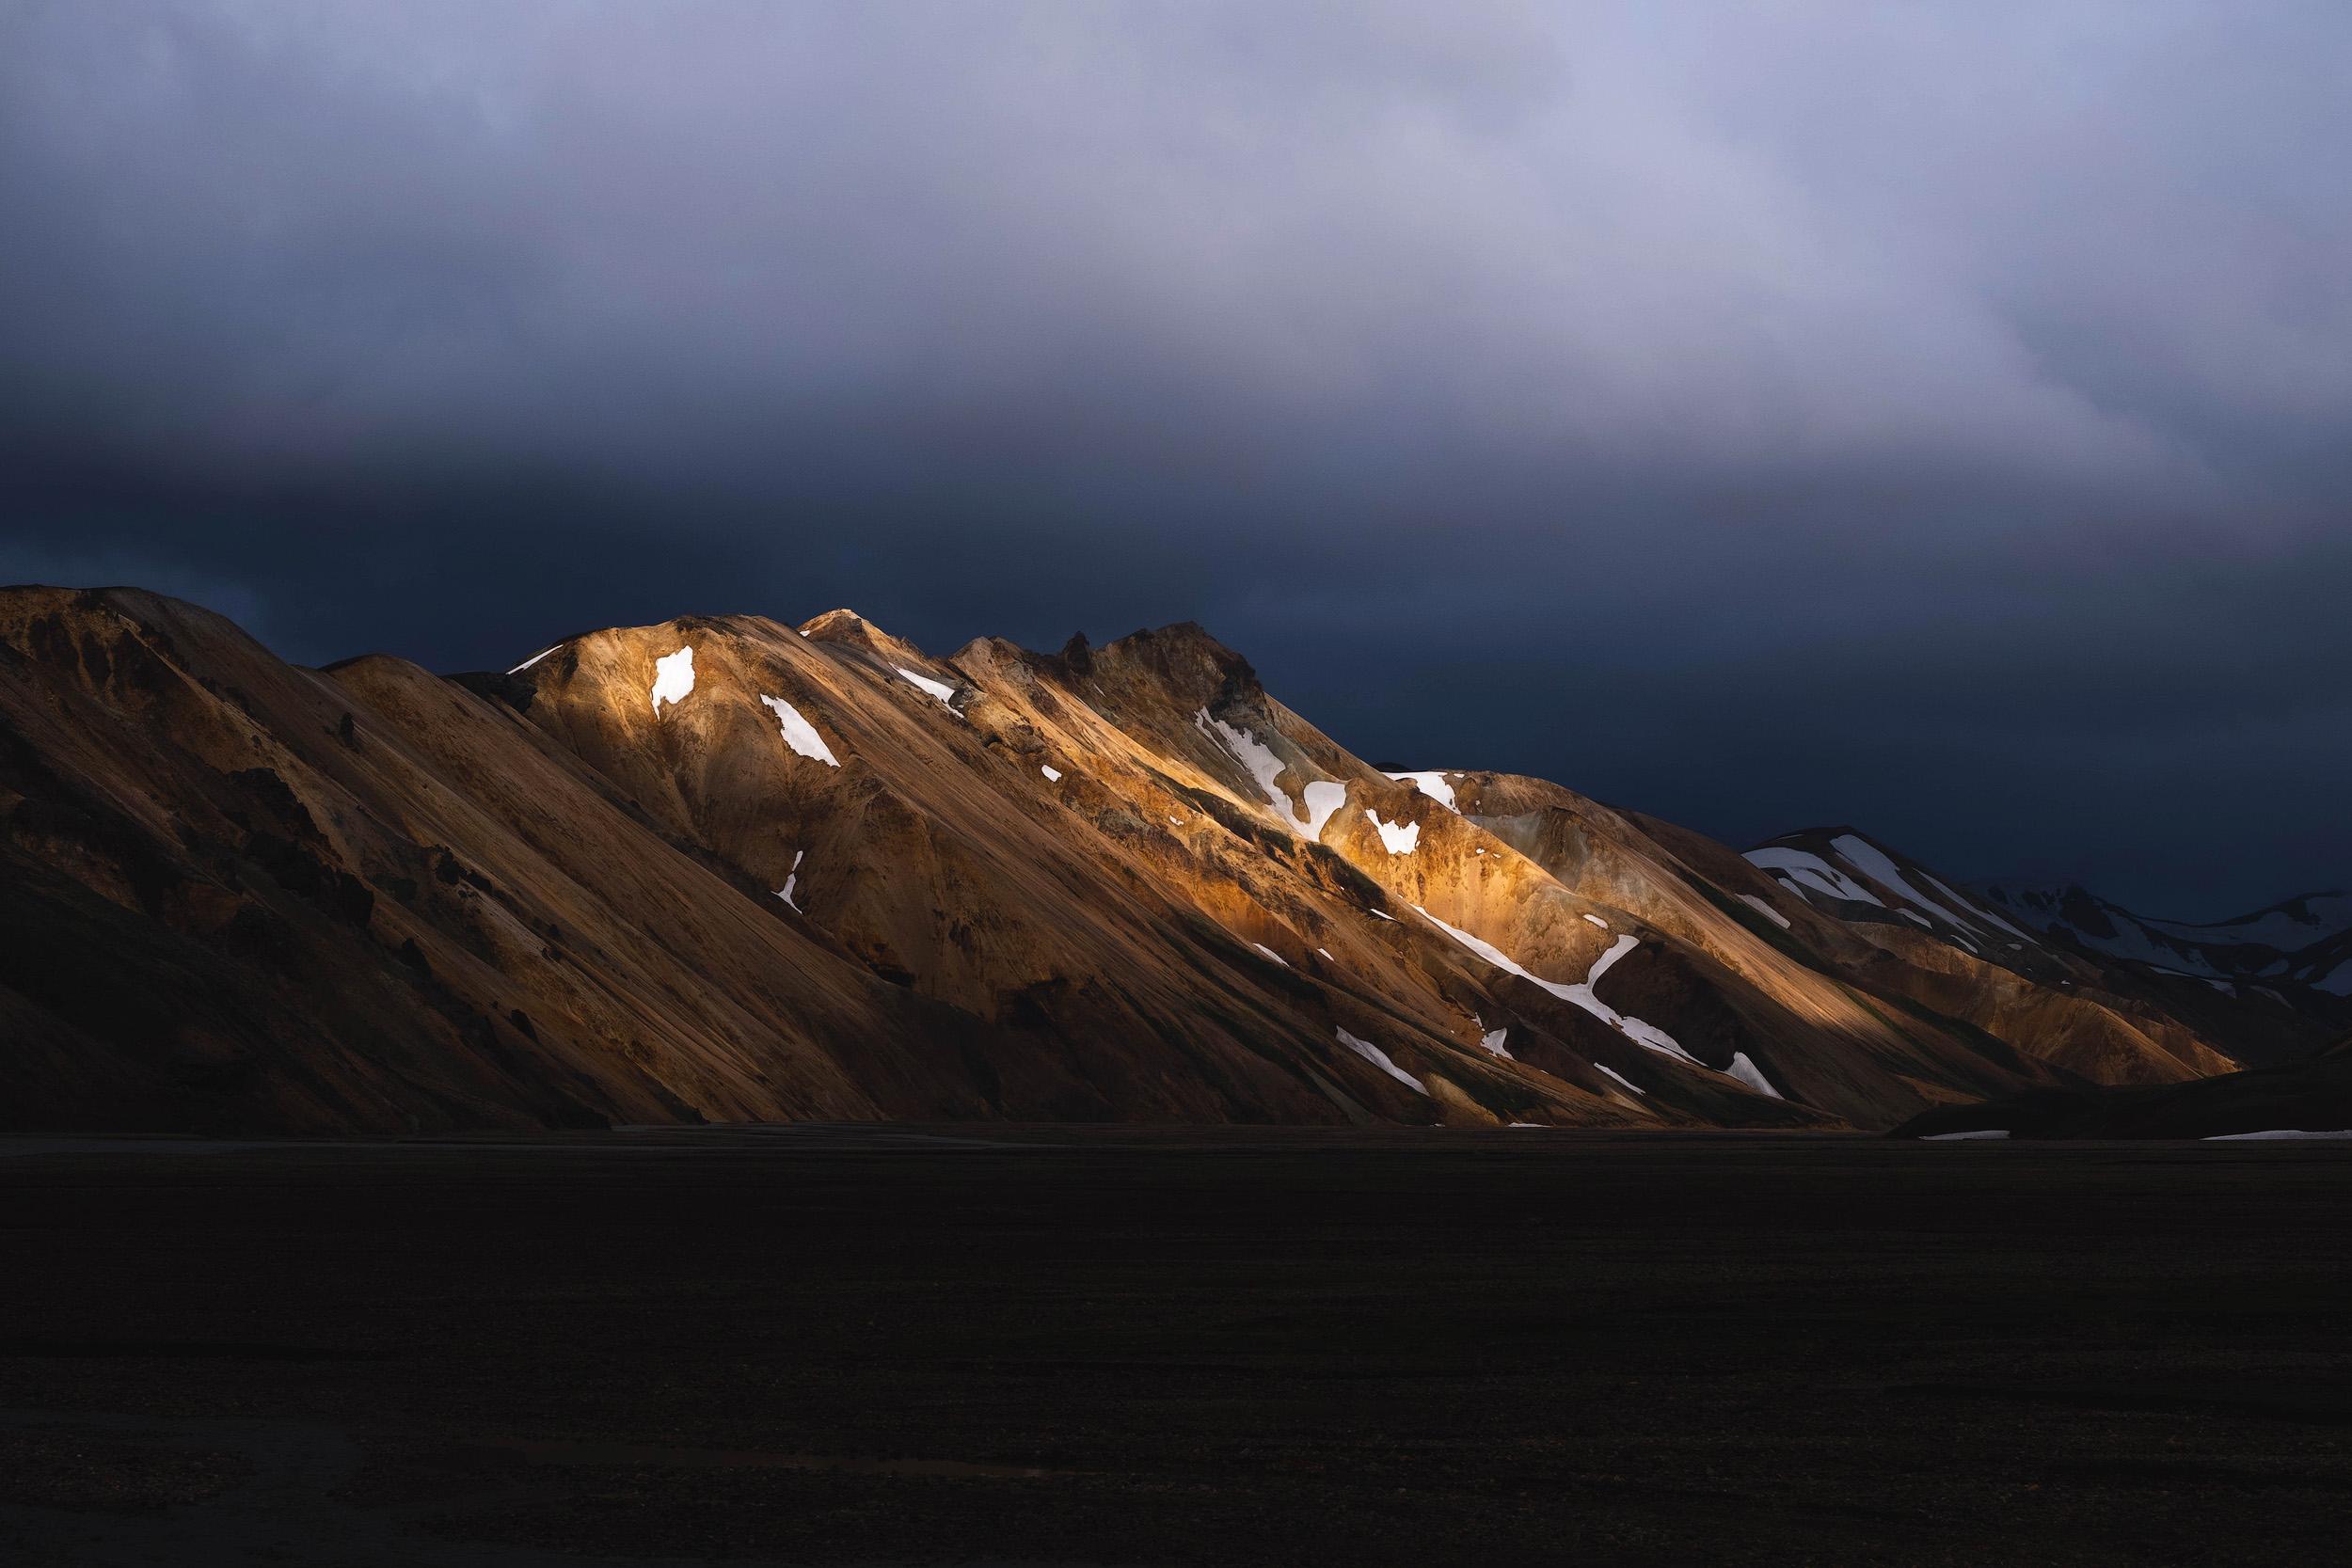 The last light of day on the rhyolite hills of Landmannalaugar